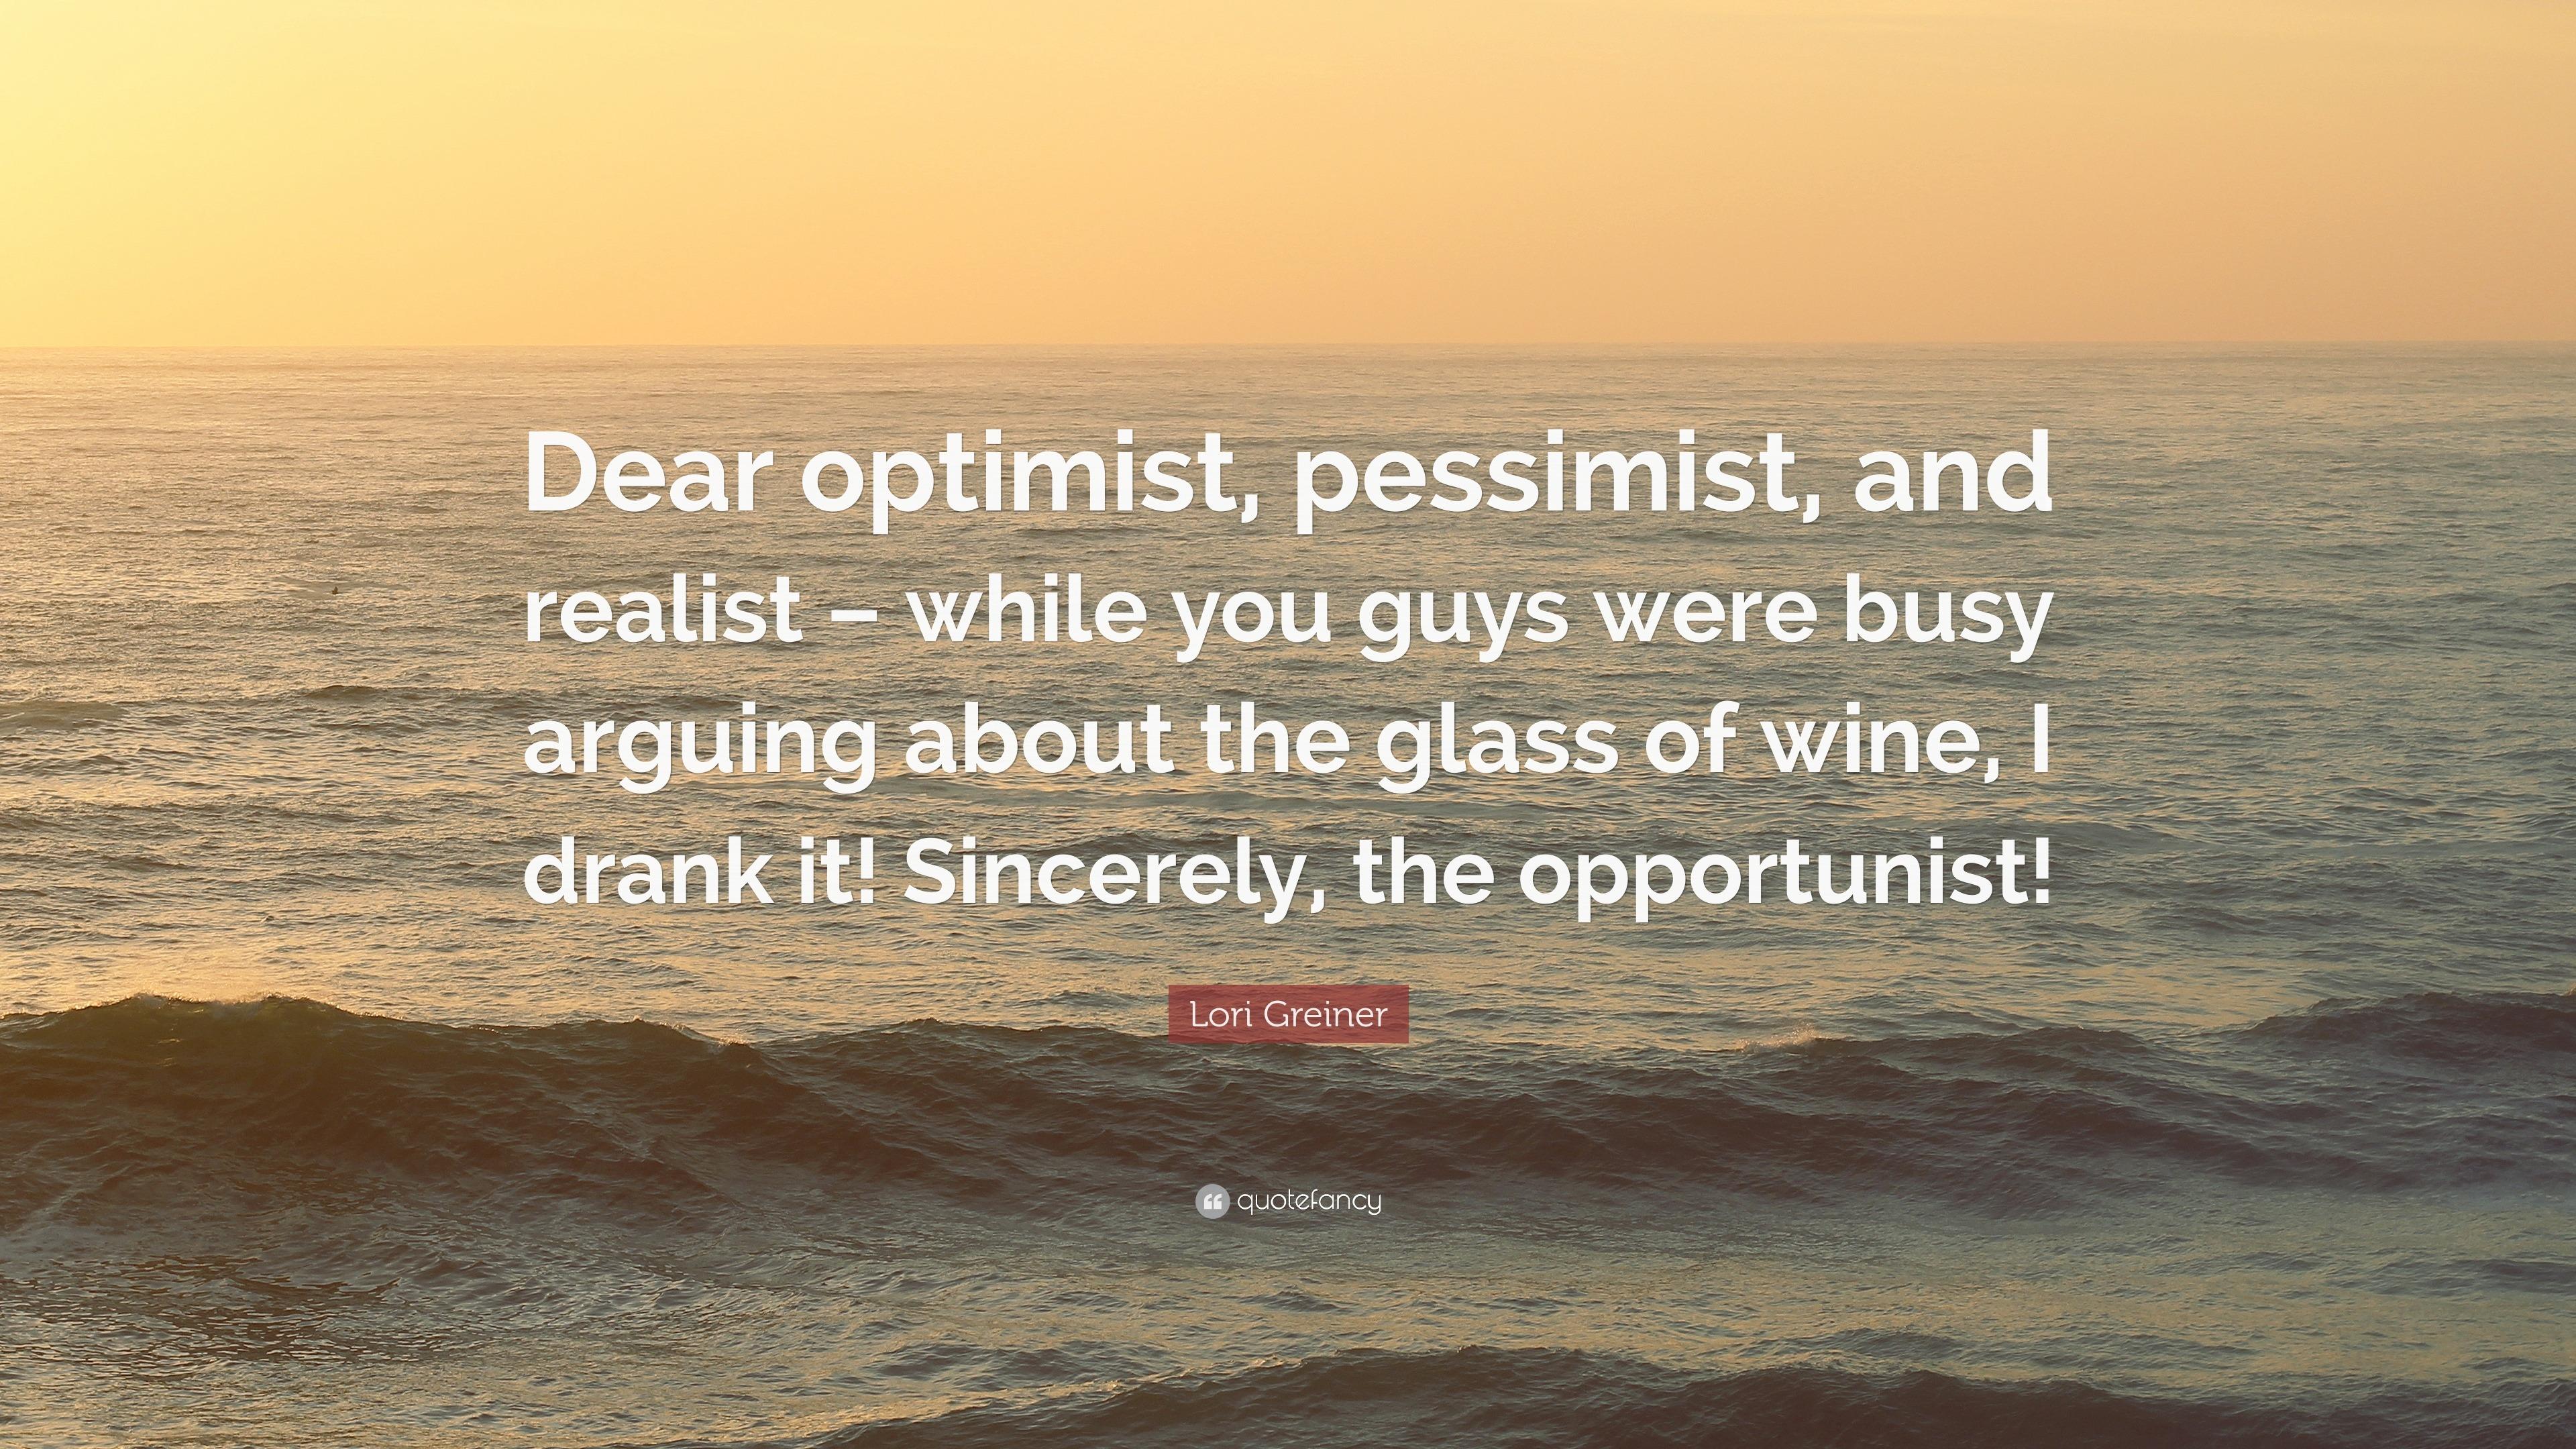 Lori Greiner Quote: Dear optimist, pessimist, and realist